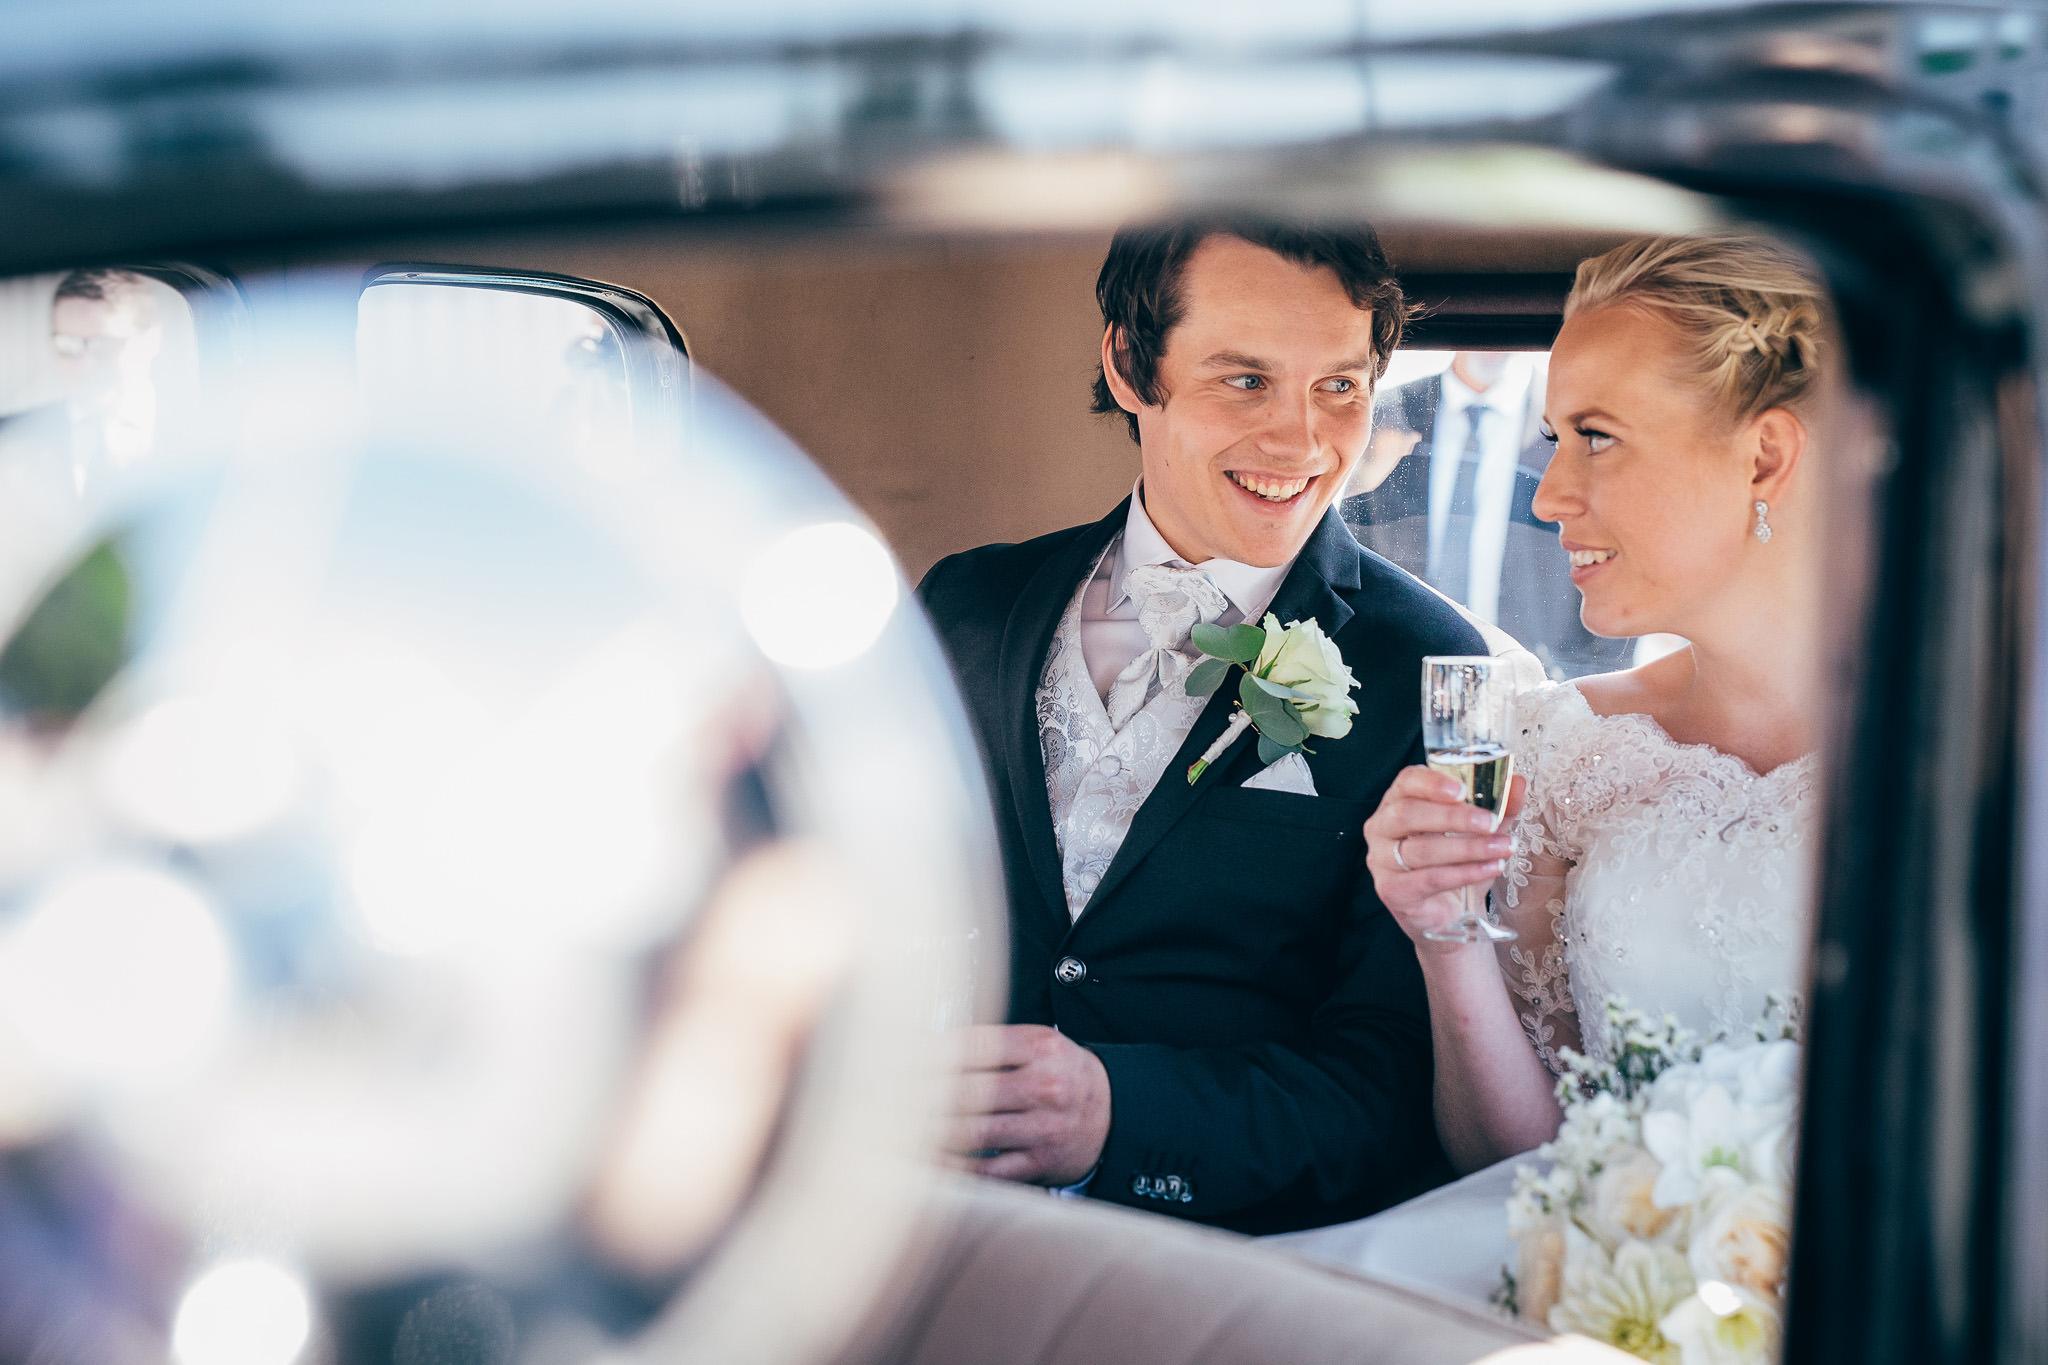 Wedding+Photographer+Norway+Bryllupsfotograf+Casey+Arneson+JT-80.jpg